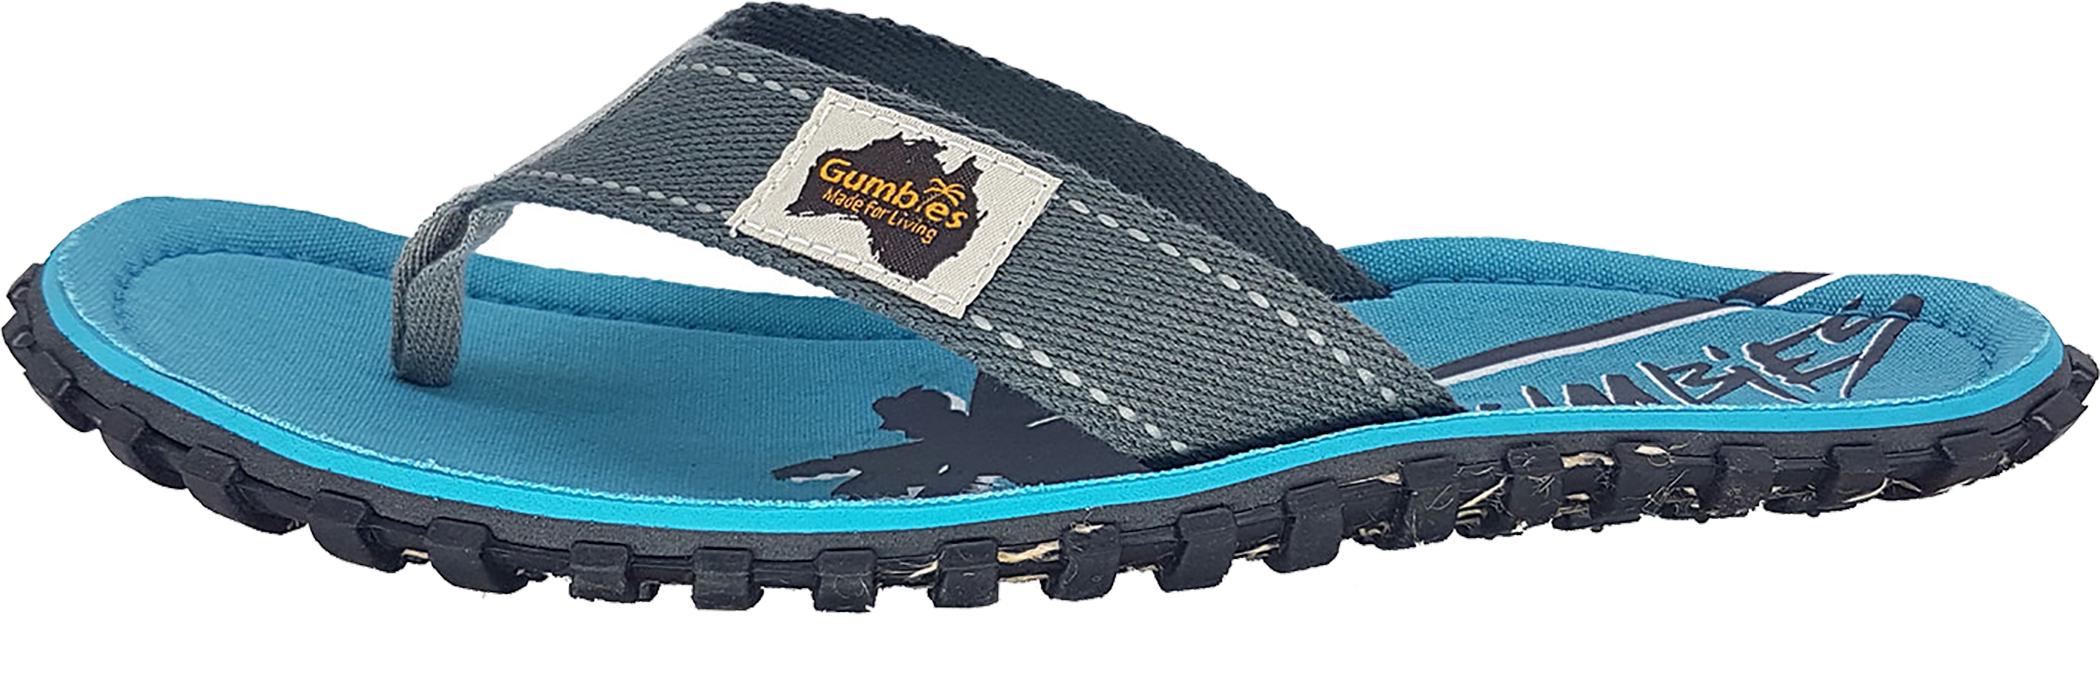 Gumbies Islander Sandale palm EU 41 CDoCnJt